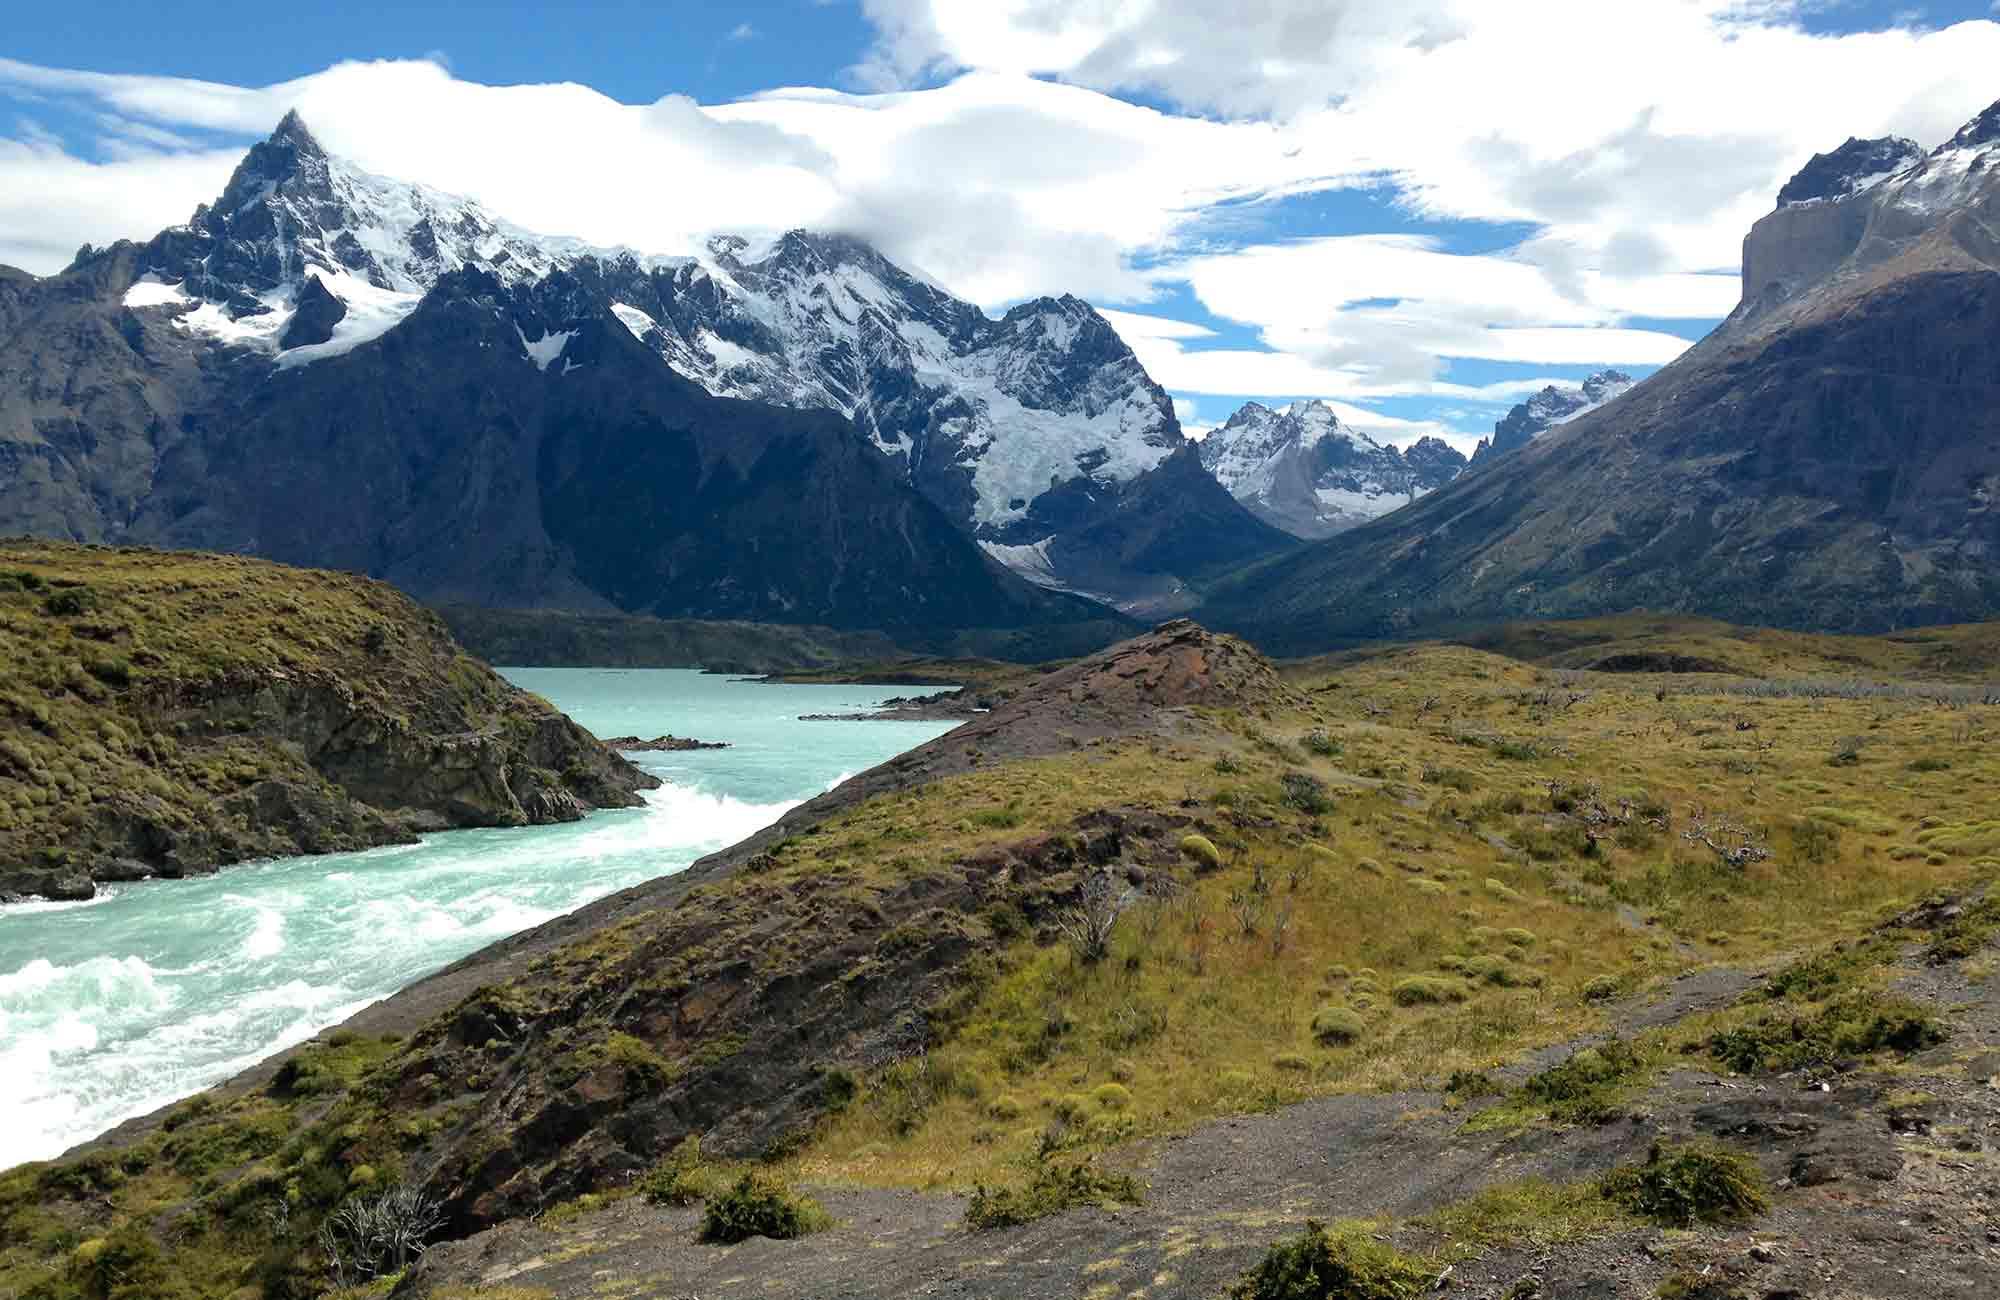 Voyage Chili - Torres del Paine en Patagonie - Amplitudes